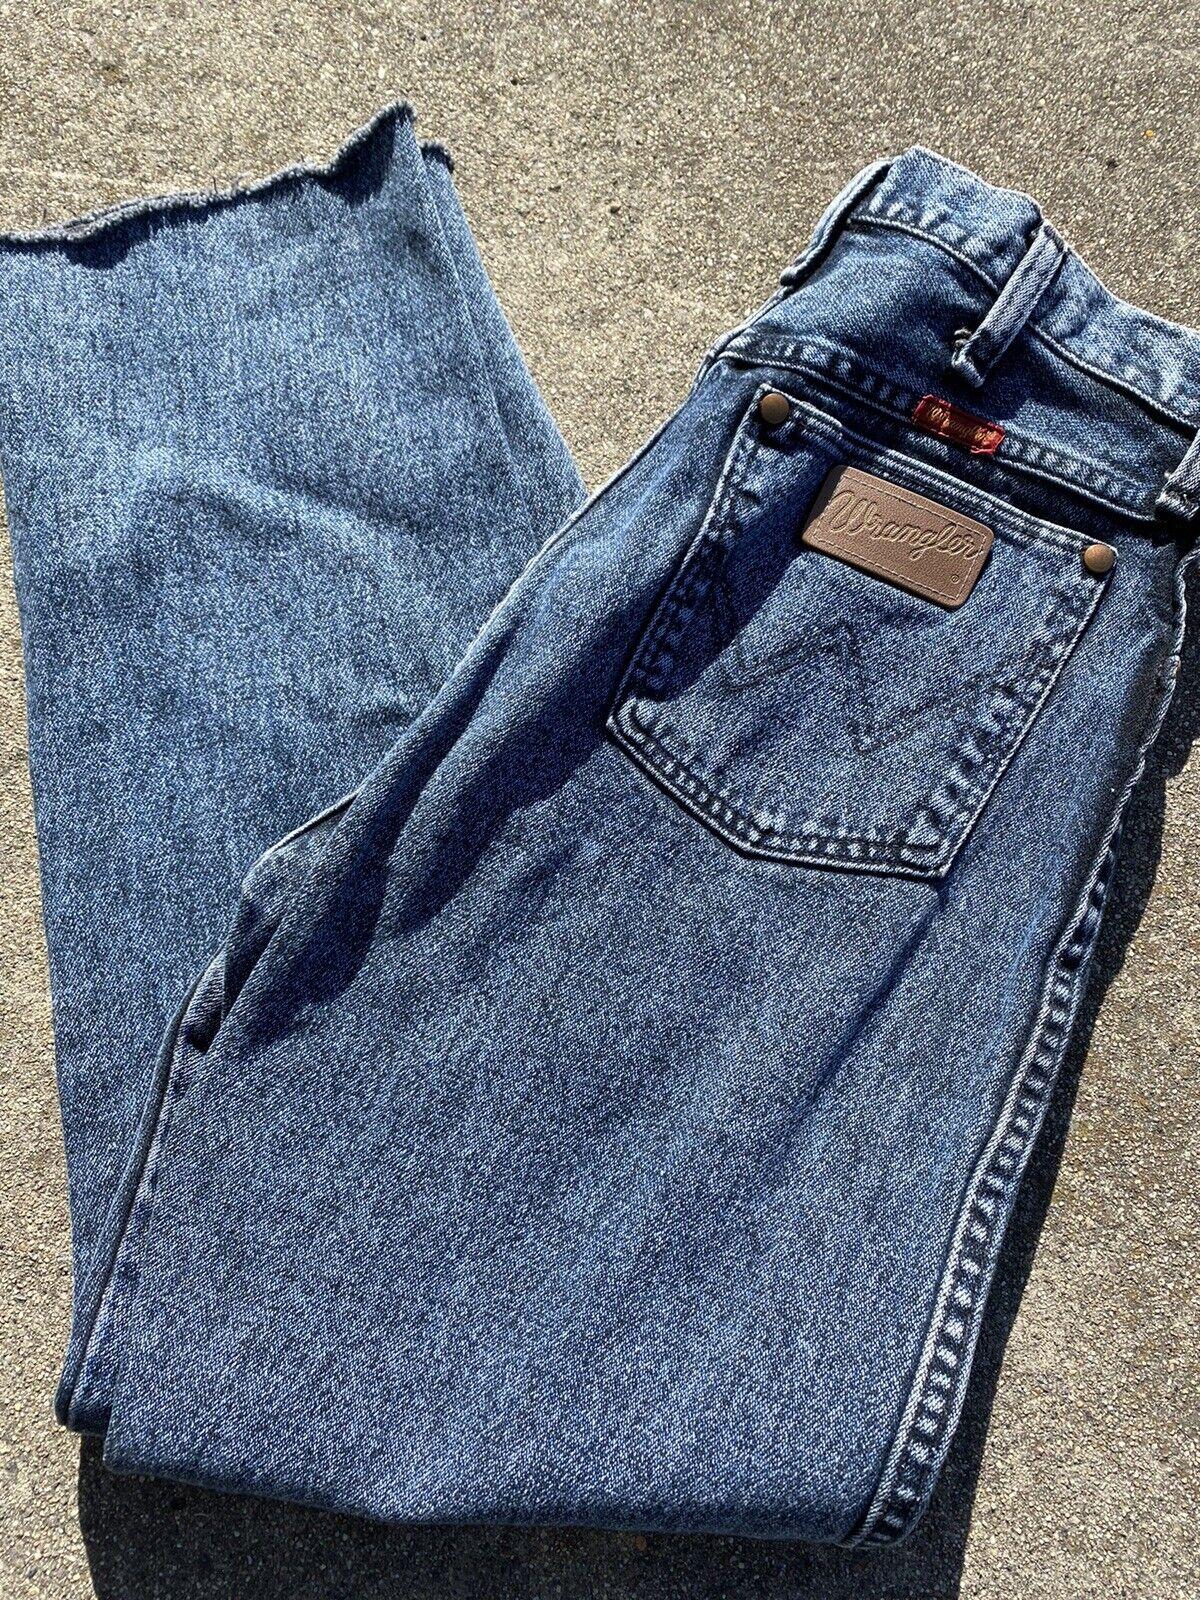 Vintage '80s Stonewashed Wrangler Jeans